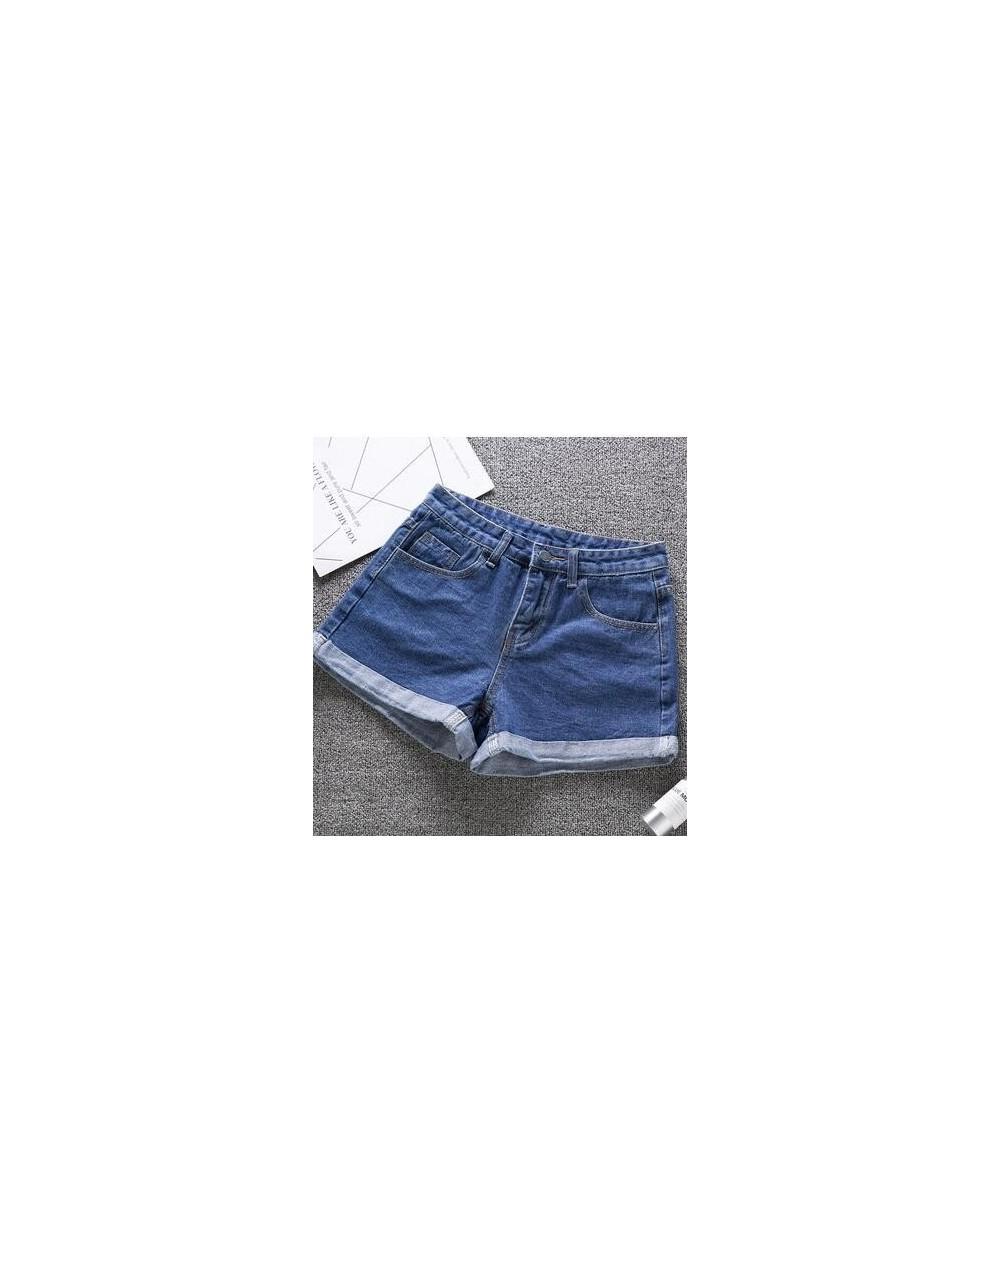 High waist denim shorts large size 2XL female short jeans women 2019 summer New Ladies shorts solid color crimp denim shorts...